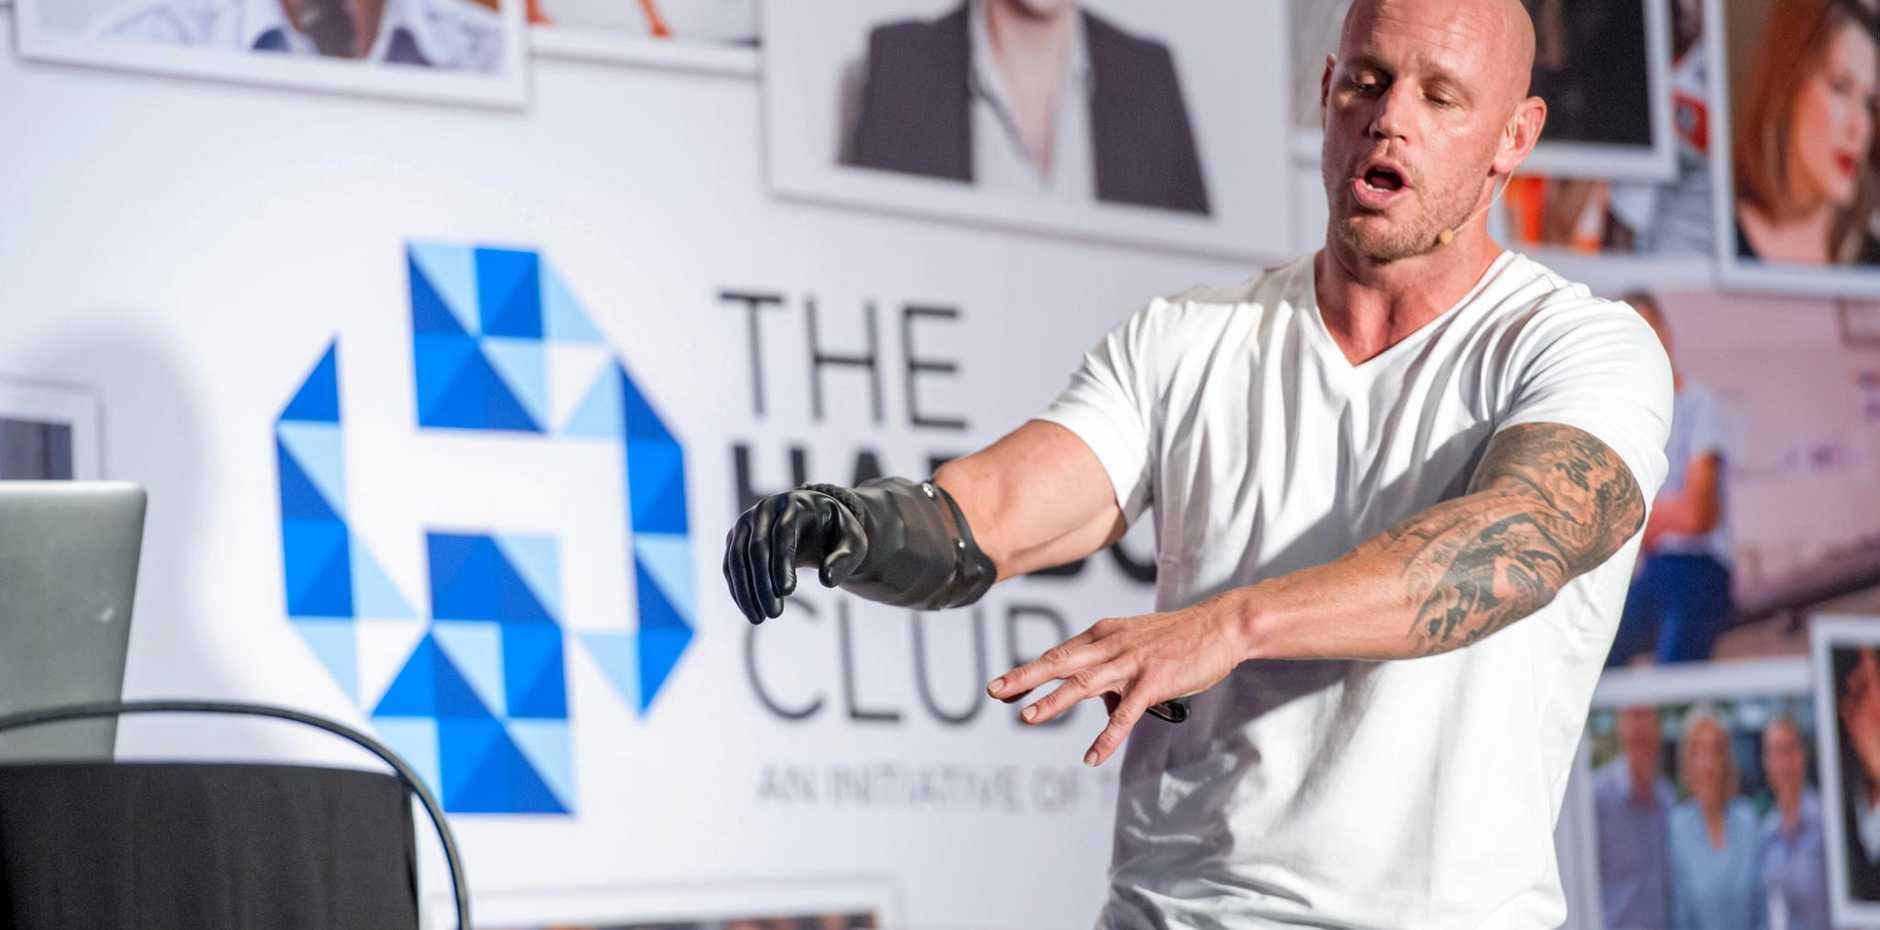 Shark attack survivor Paul de Gelder shares his powerful story with The Coffs Coast Advocate's Harbour Club at C.ex Coffs.